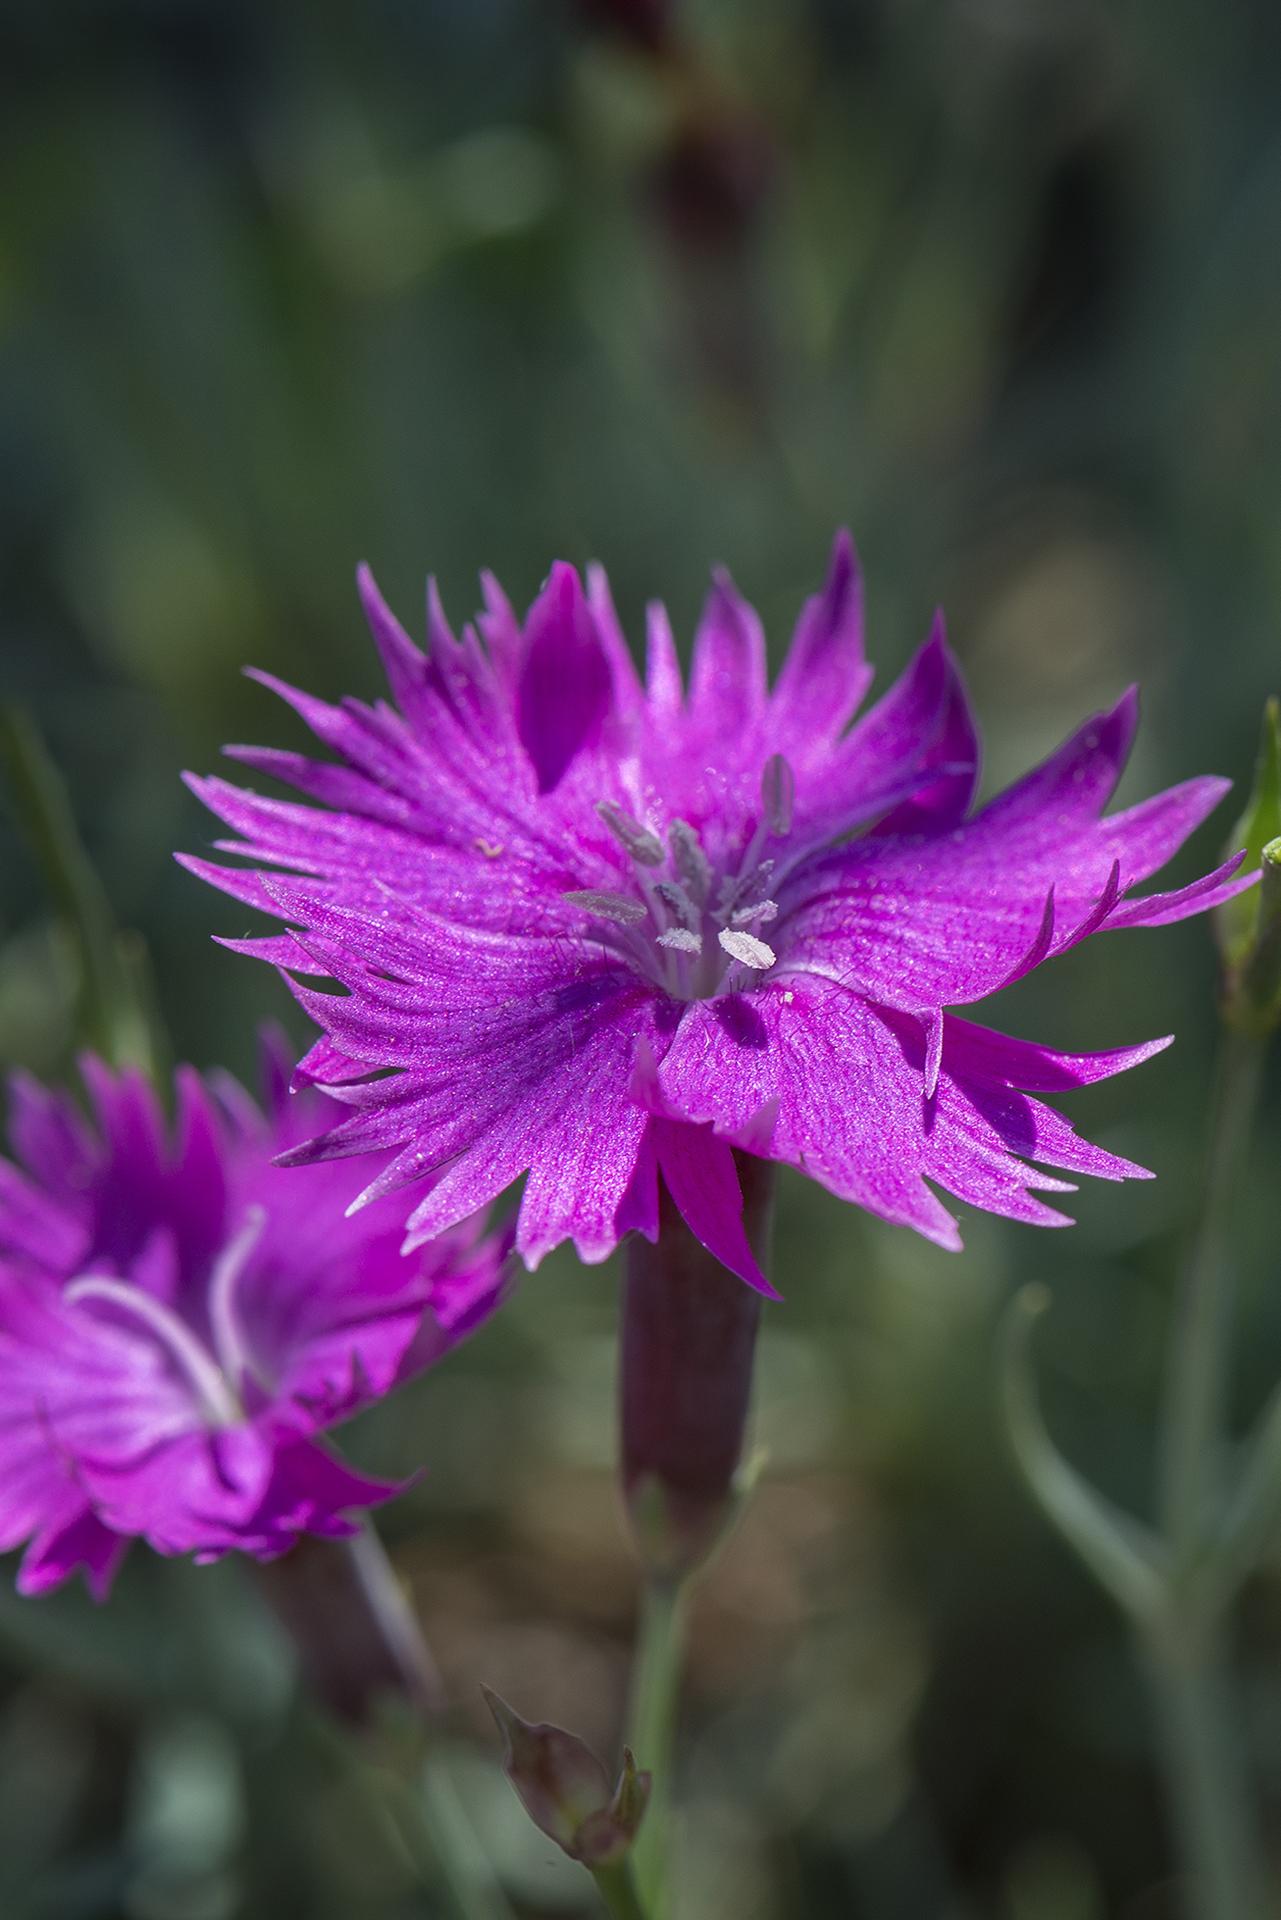 Dianthus gratianopolitanus 'Firewitch' (Cheddar Pink)